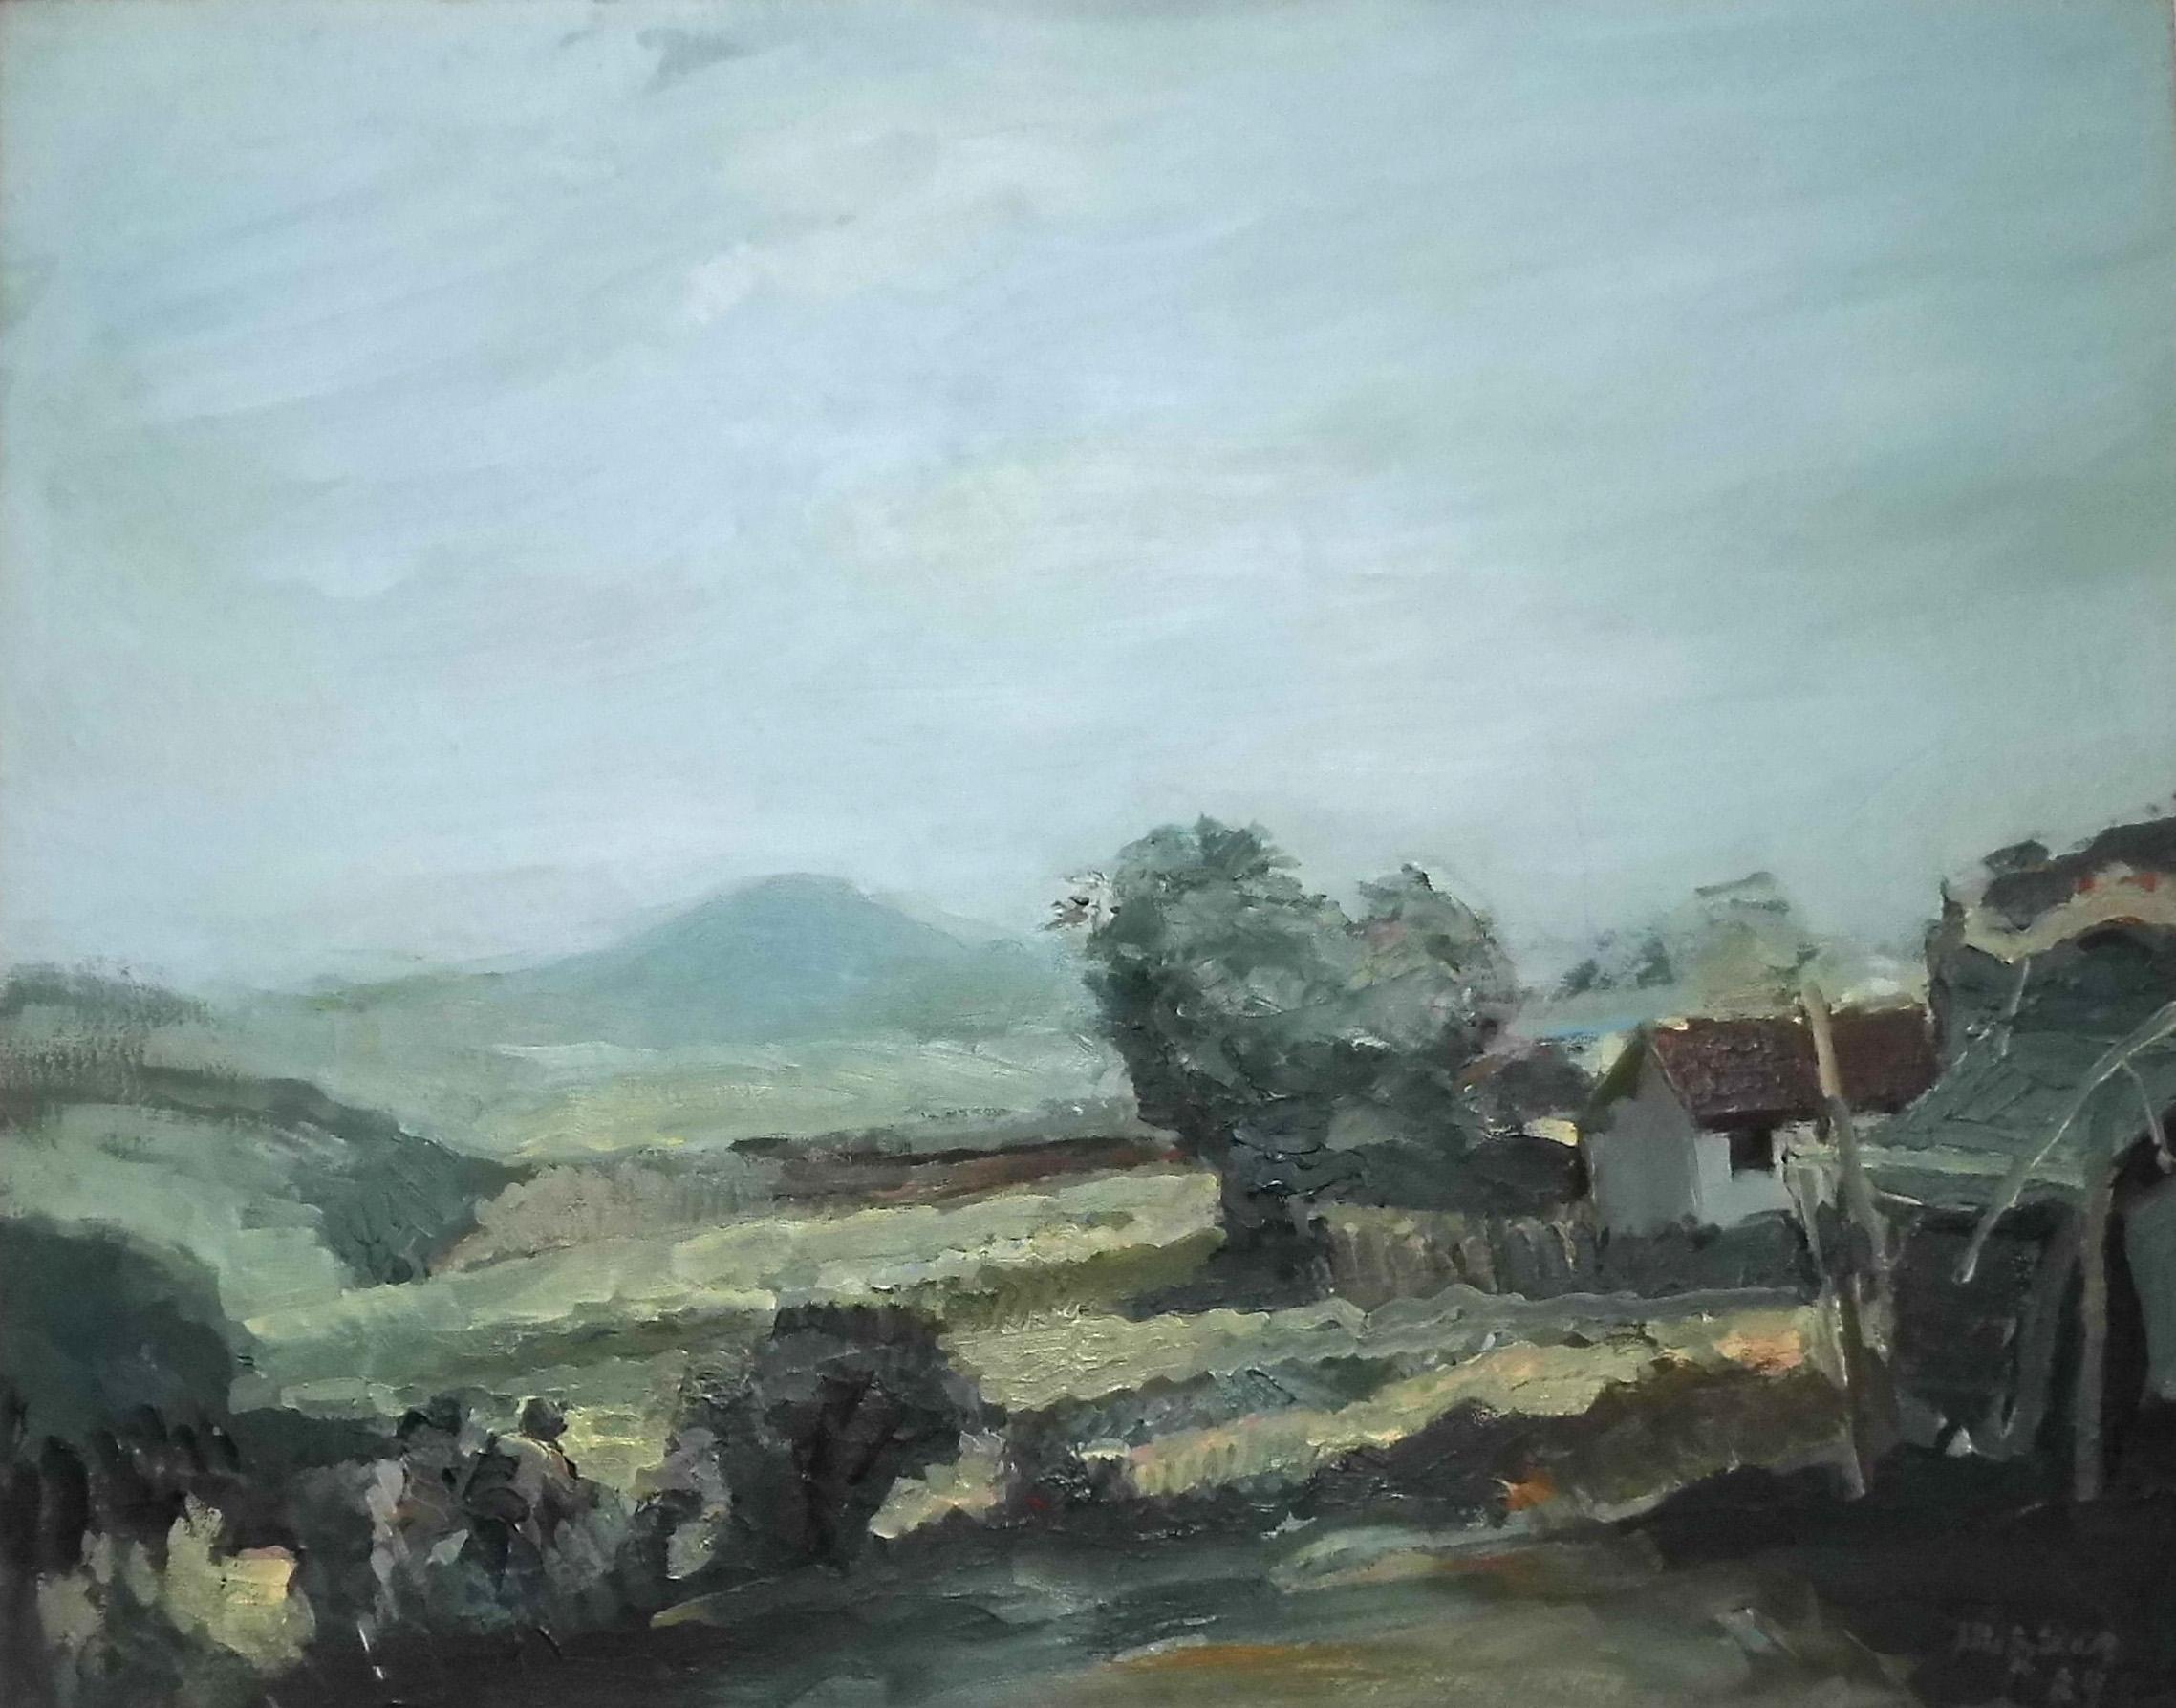 01-harald_metzkes-landschaft_lausitz-1984-oel_auf_leinwand-40x50